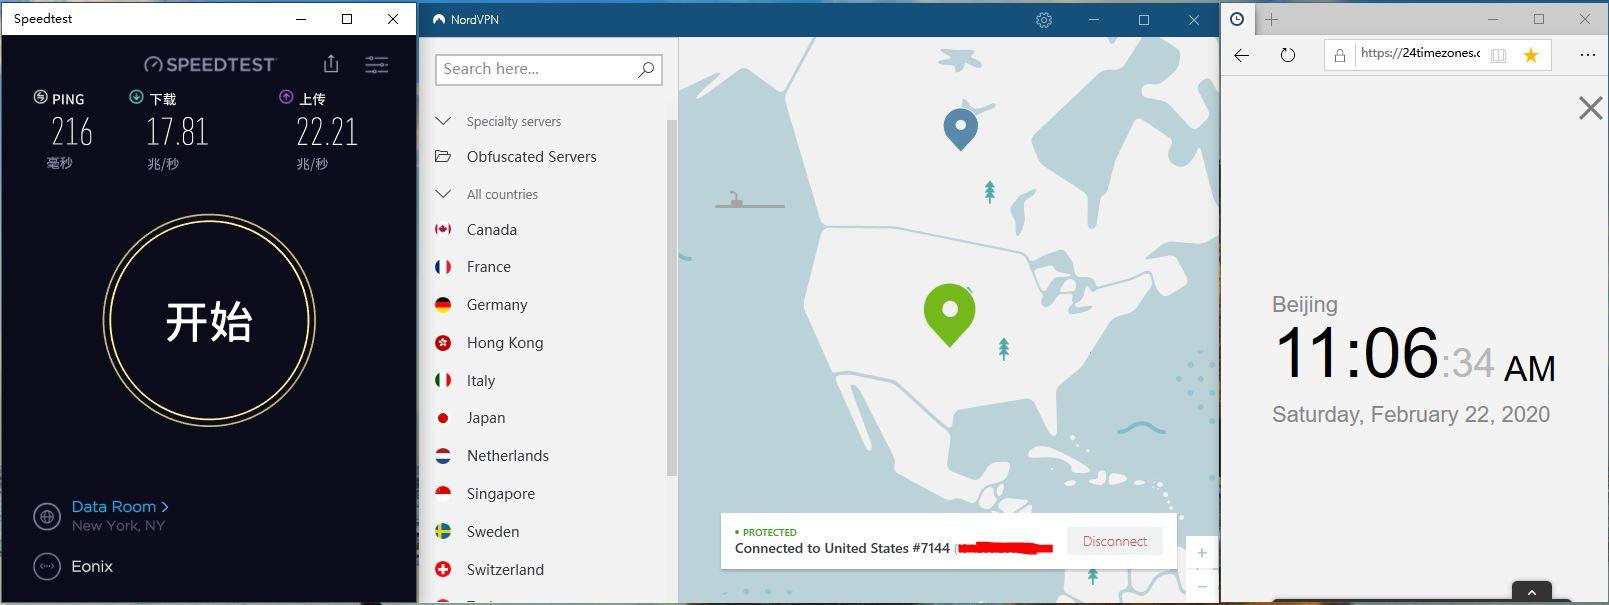 Windows10 NordVPN USA-7144 中国VPN翻墙 科学上网 SpeedTest测试 - 20200222